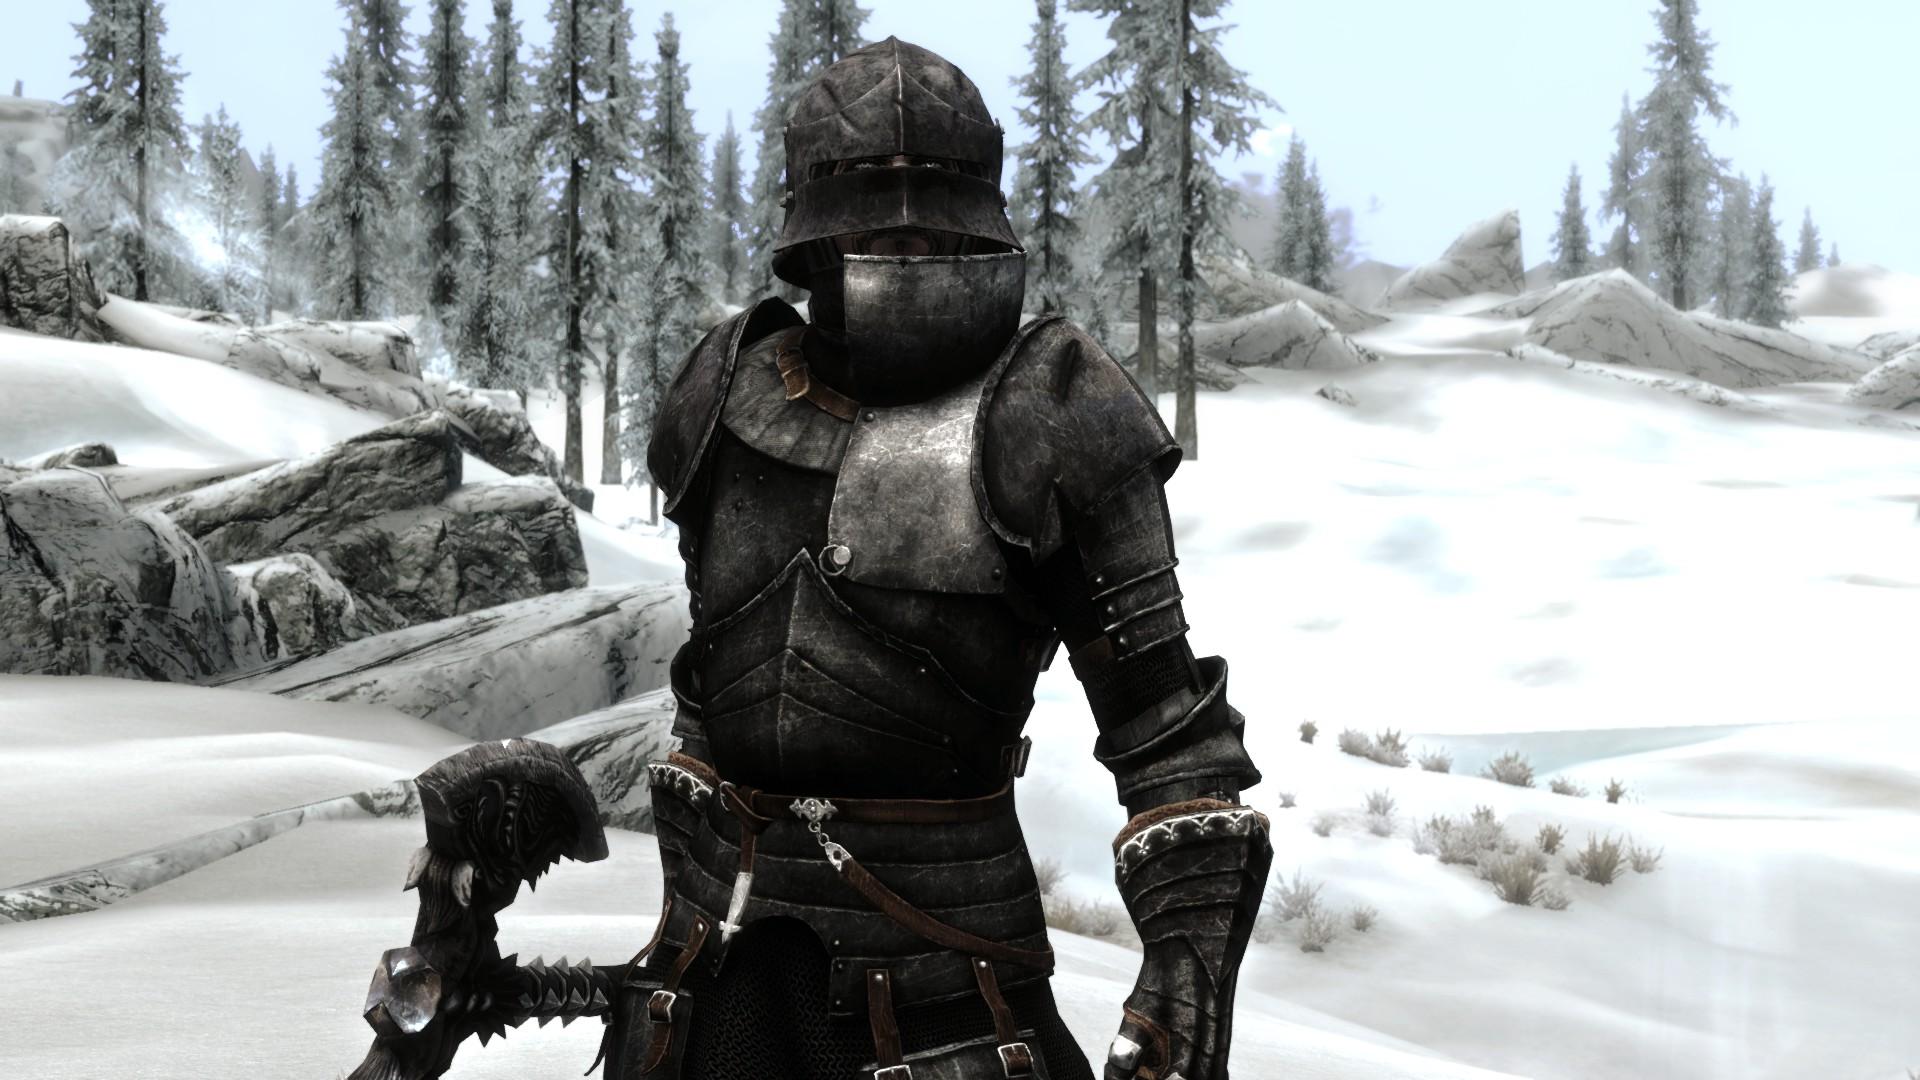 Dark knight armor